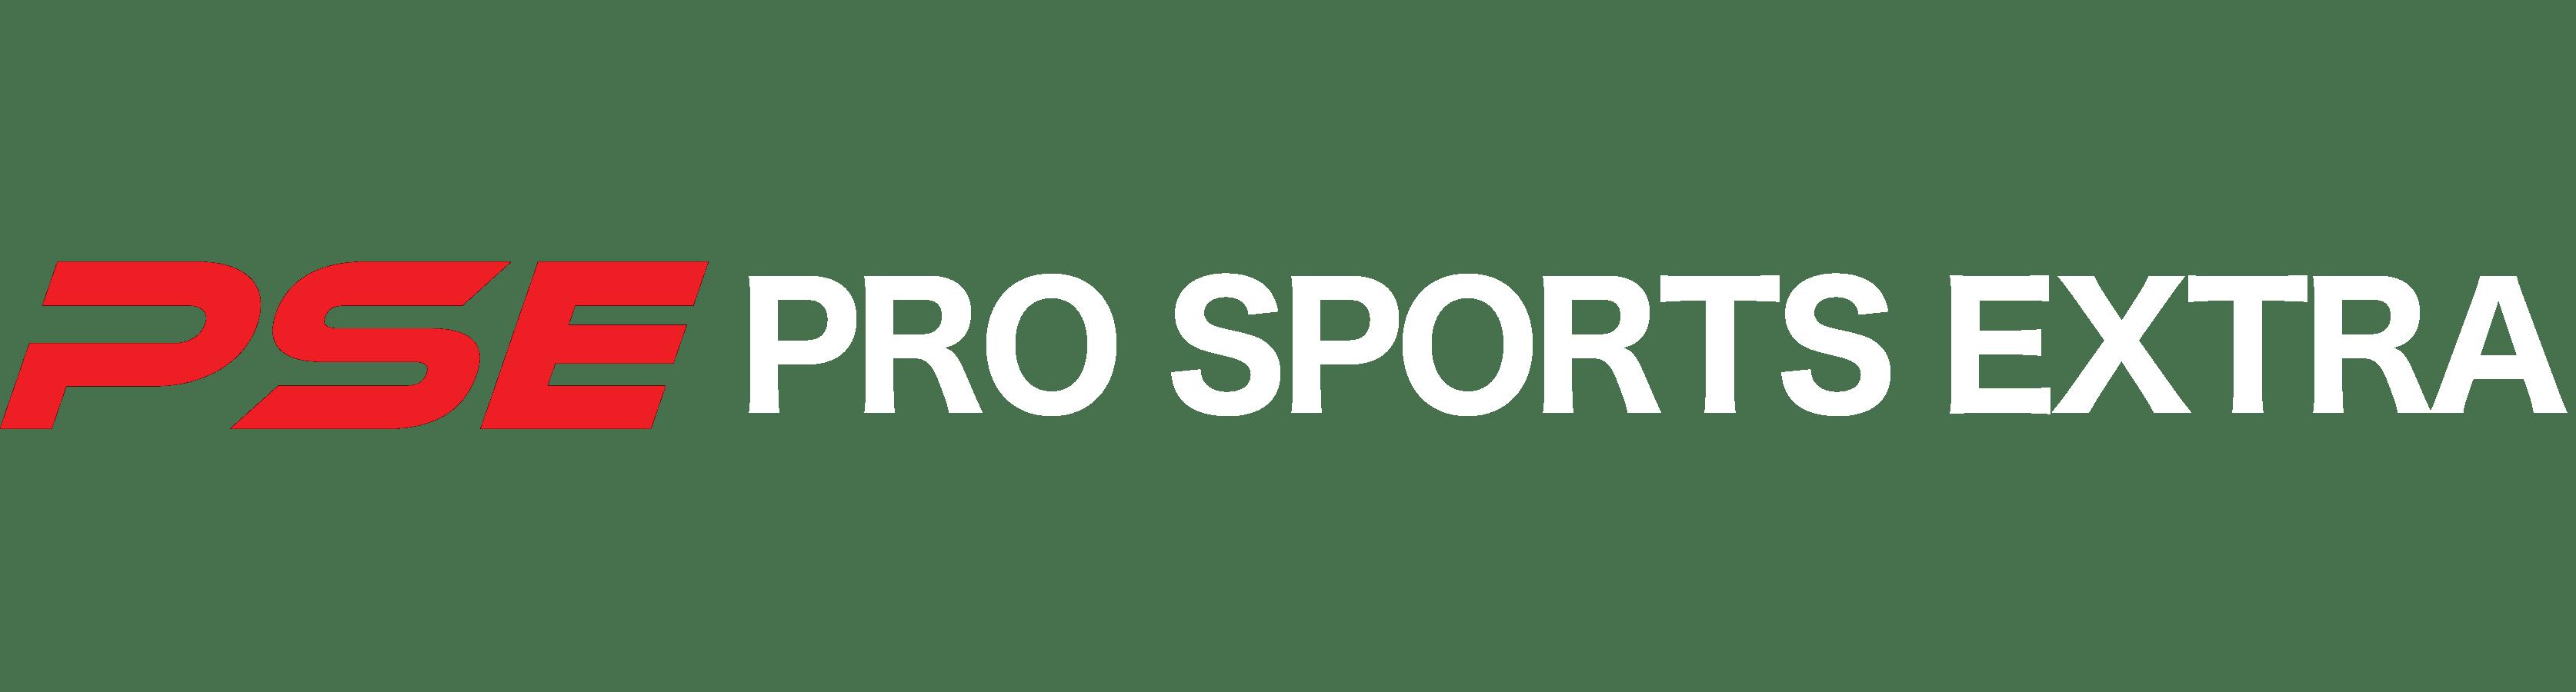 Pro Sports Extra |